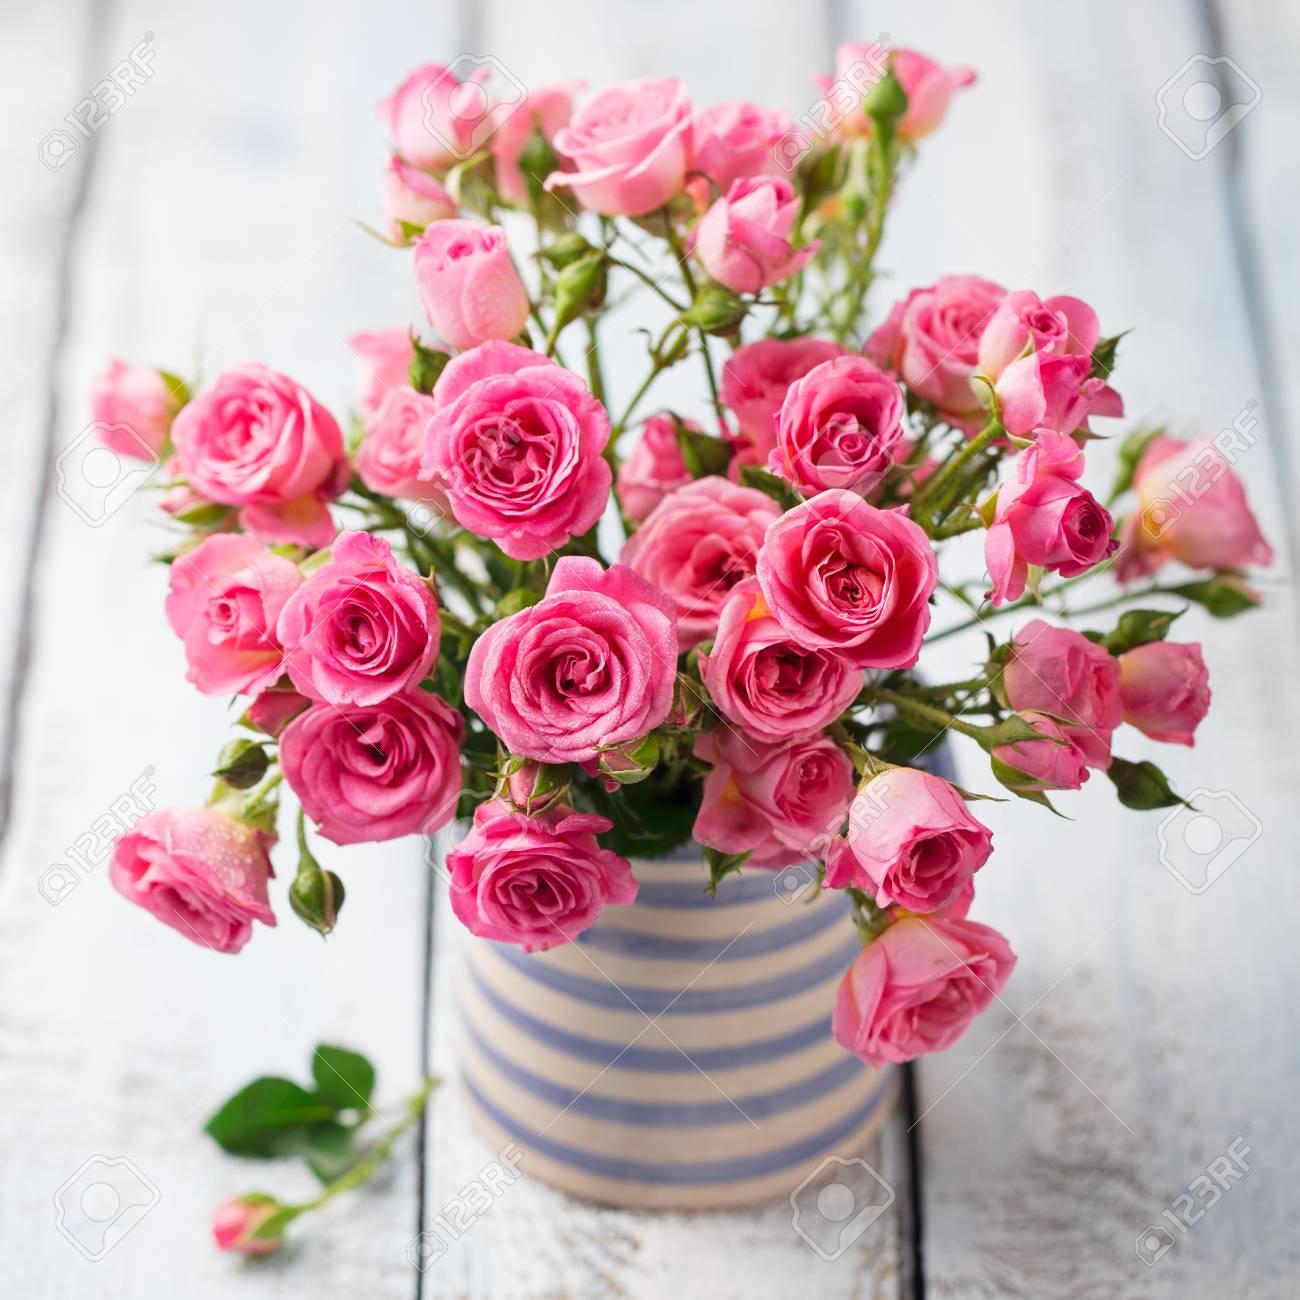 Rose flowers in vase. Beautiful romantic bouquet. Copy space Stock Photo - 96010721 & Rose Flowers In Vase. Beautiful Romantic Bouquet. Copy Space Stock ...